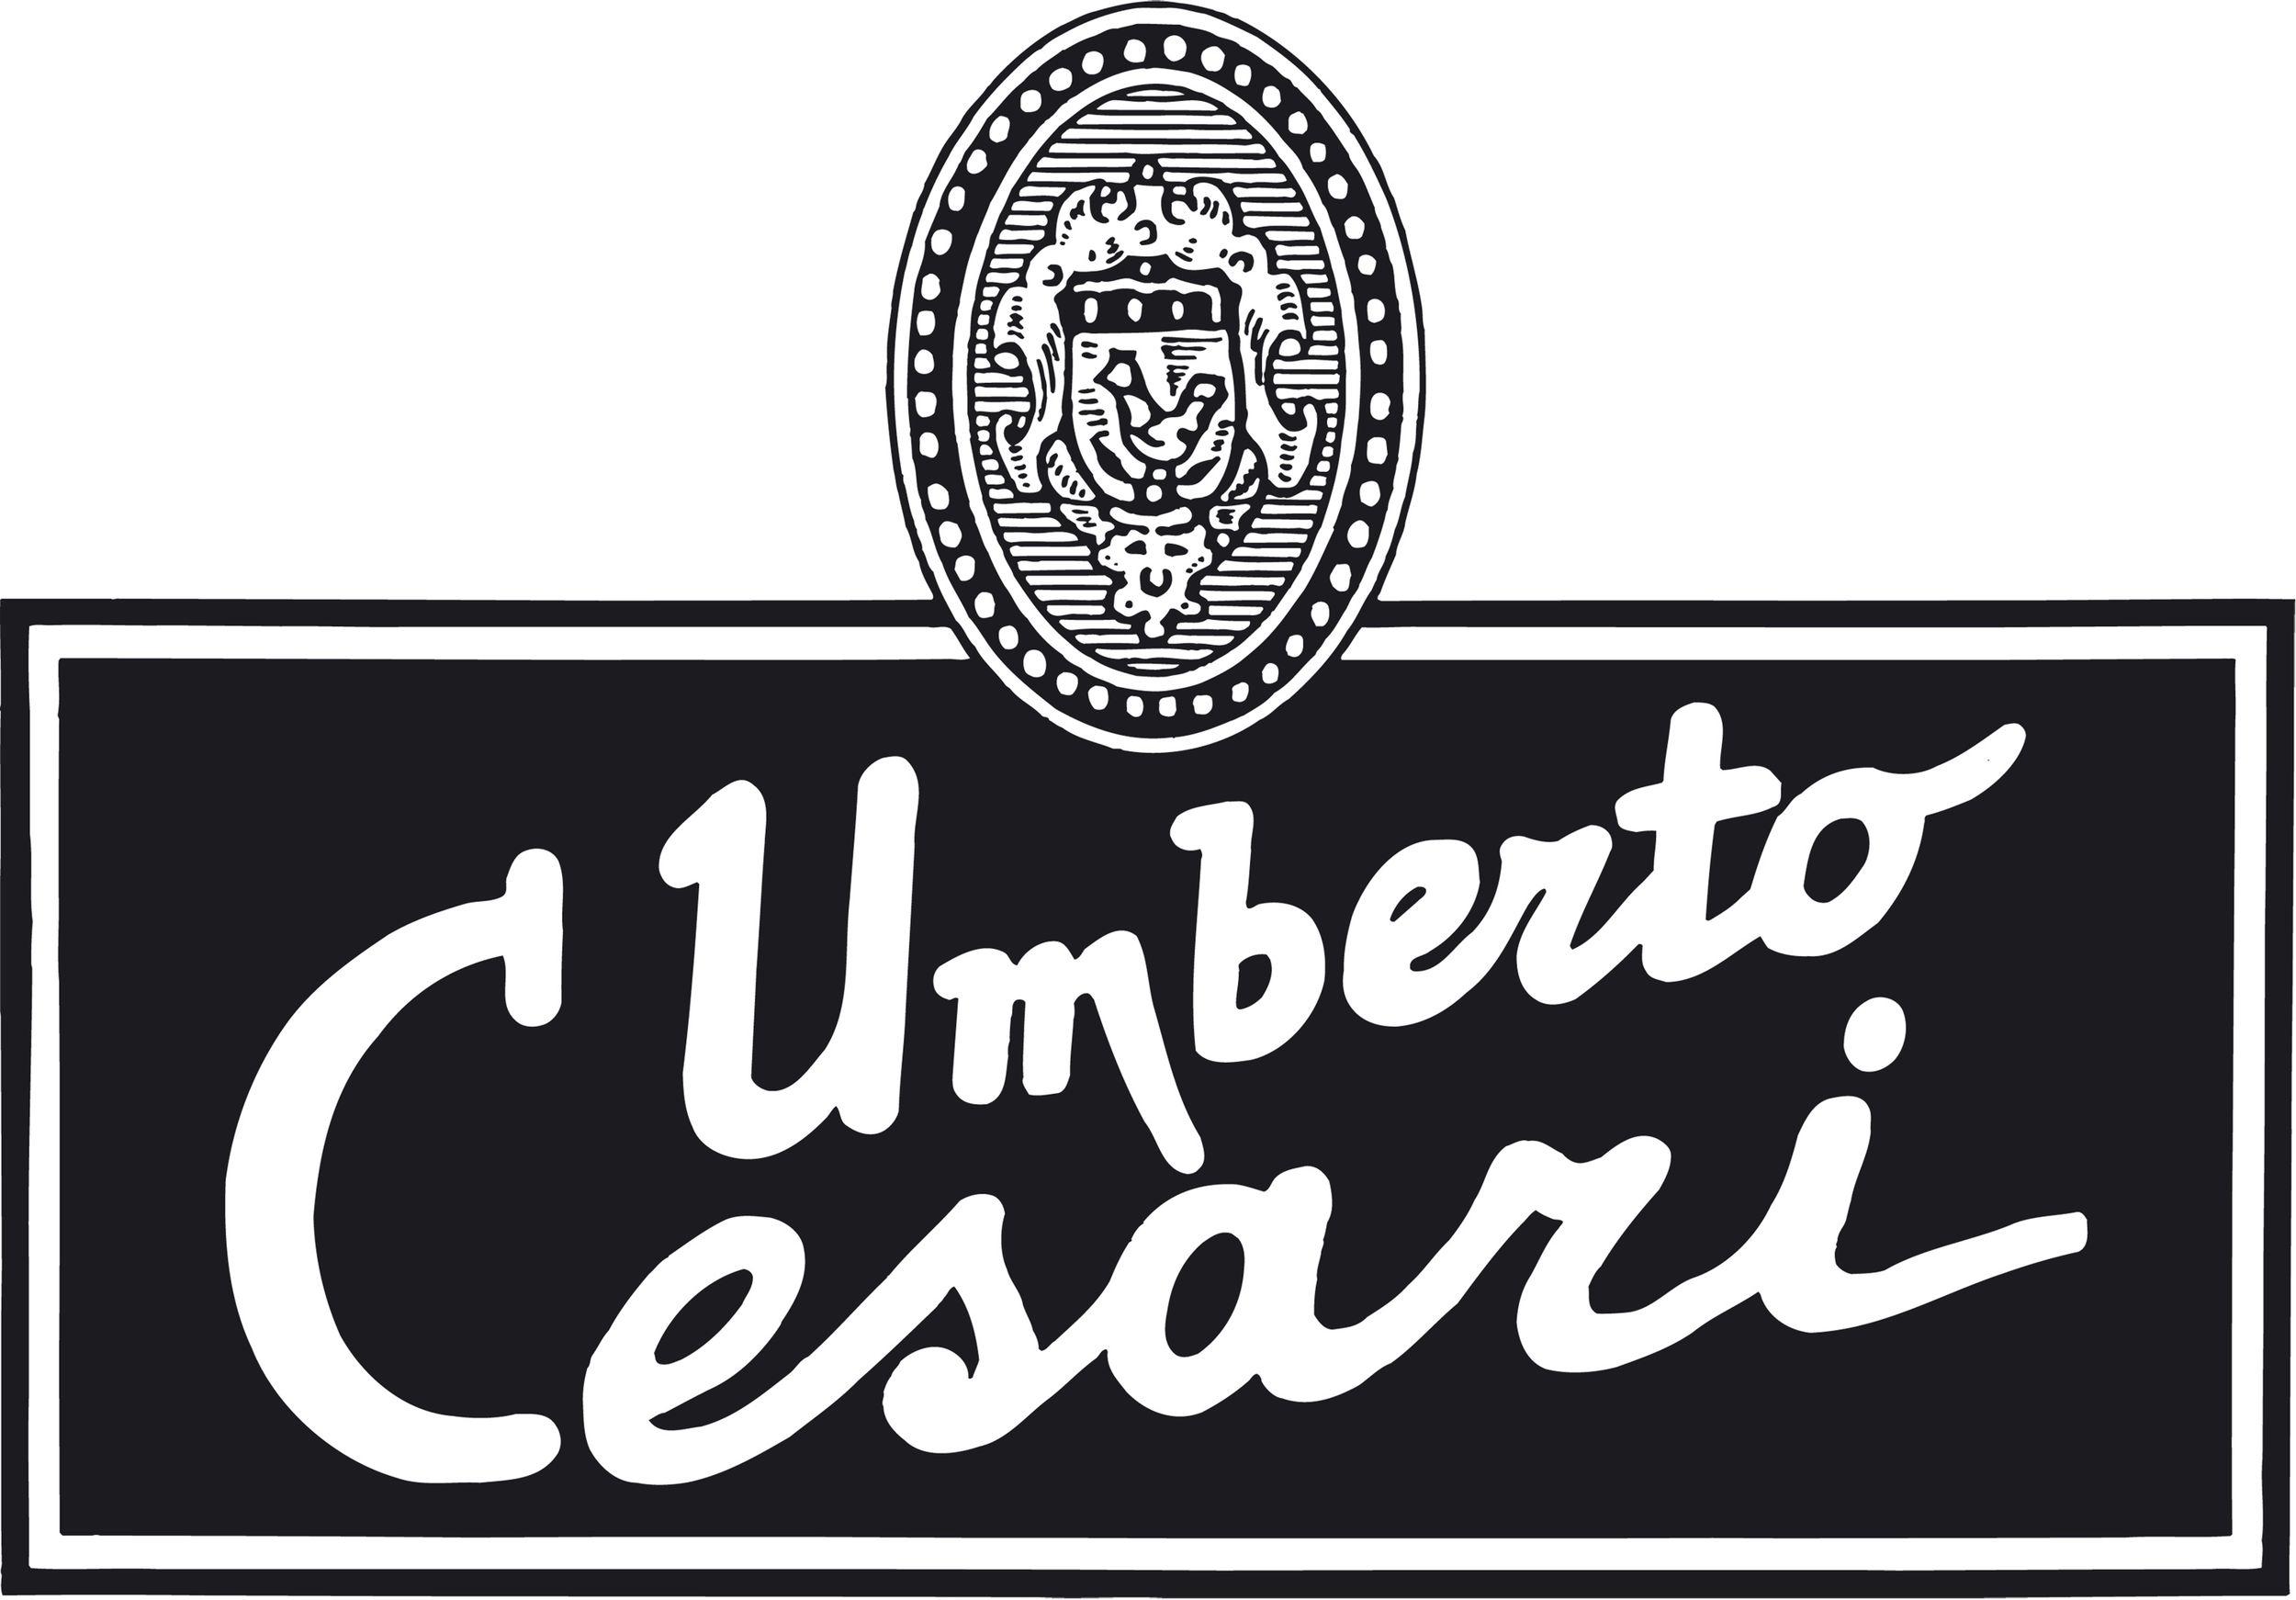 義大利Umberto Cesari酒莊